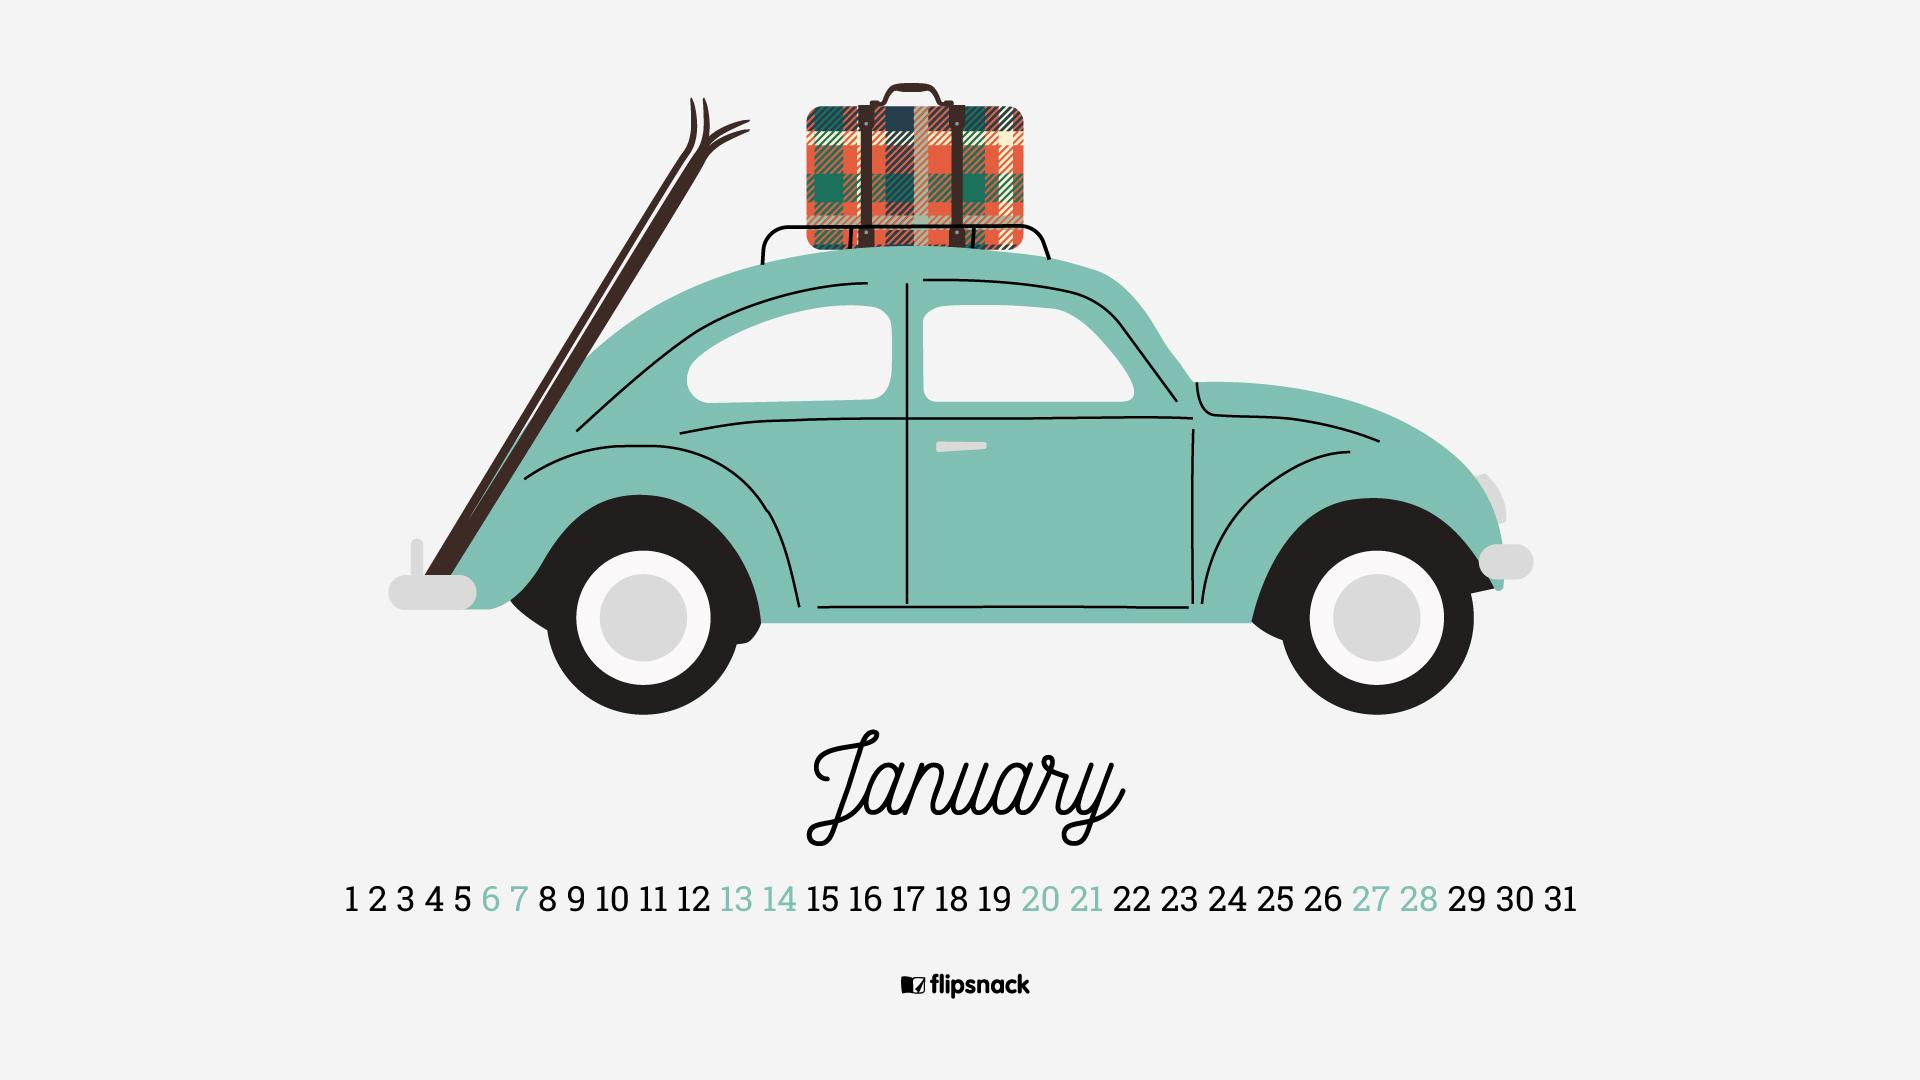 January 2018 calendar wallpaper for desktop background 1920x1080